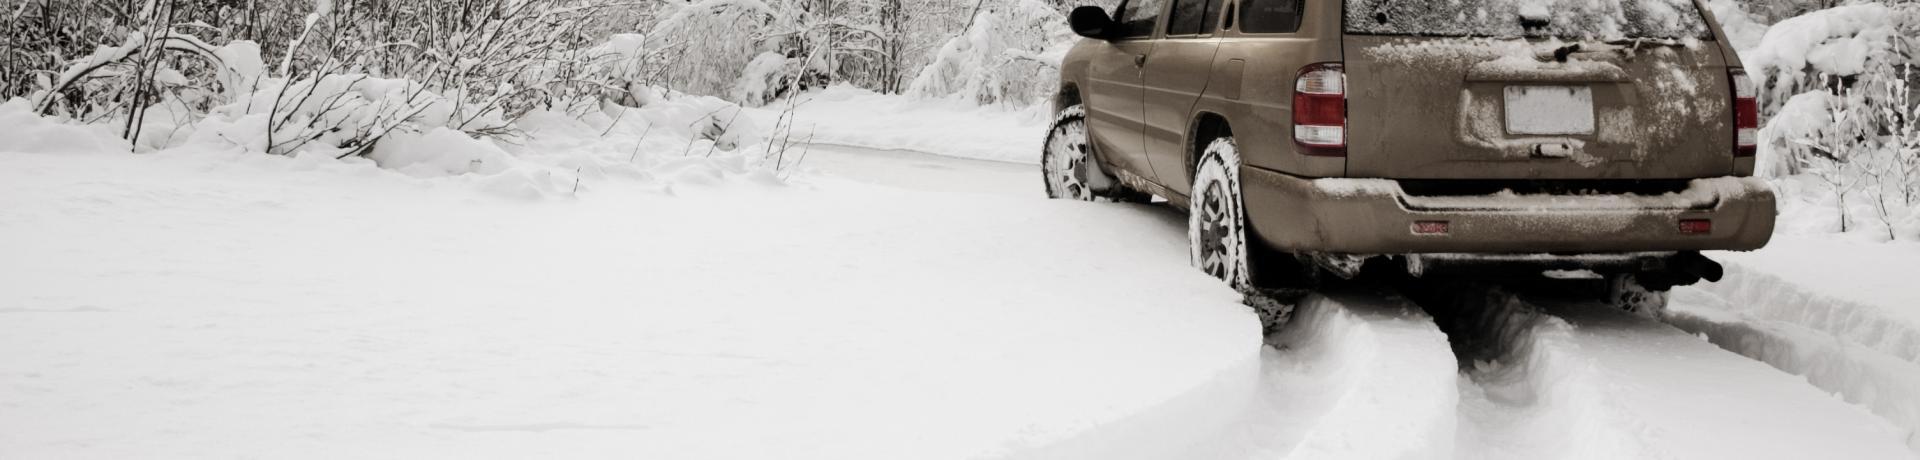 Schnee+Wald+Auto+GI-108129575.jpg